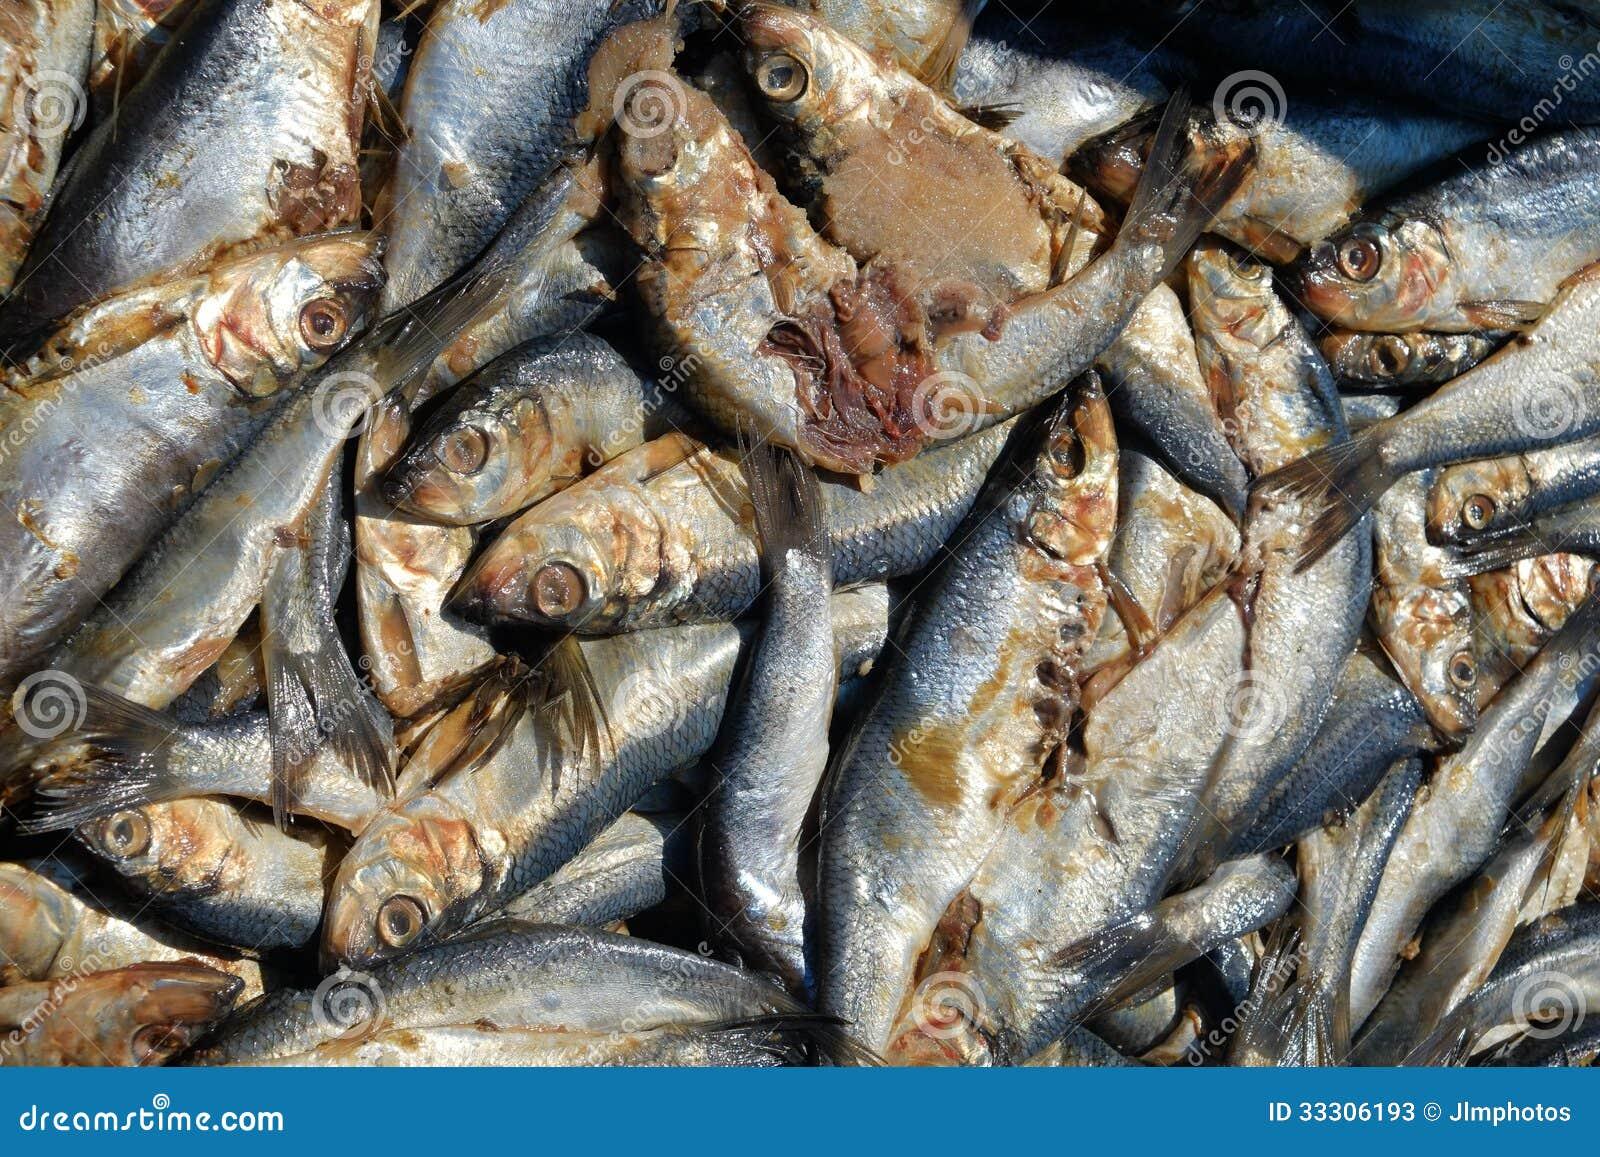 Fresh Krill Used As Bait Stock Photos - Image: 33306193